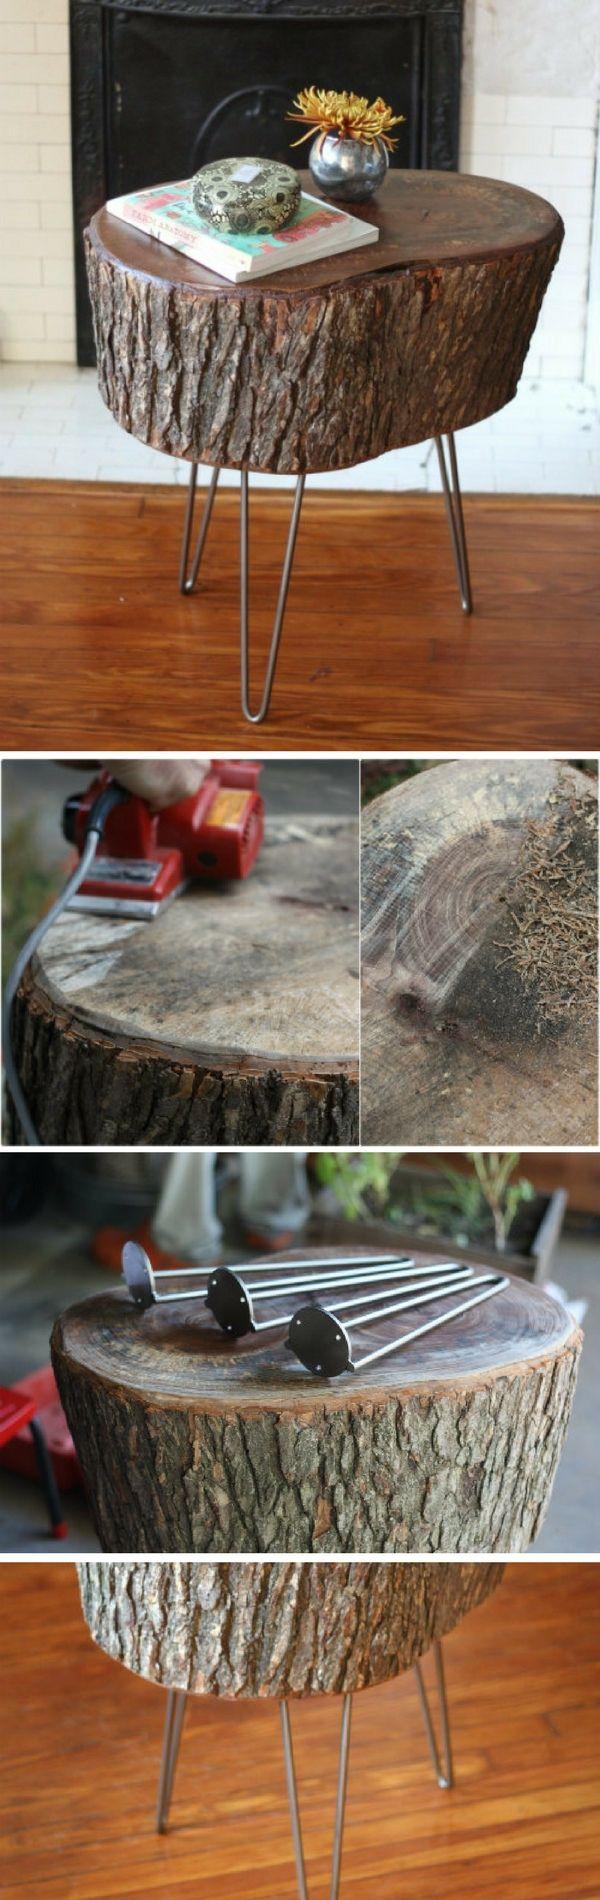 best 10 tree stump furniture ideas on pinterest tree stumps natural wood furniture and tree. Black Bedroom Furniture Sets. Home Design Ideas